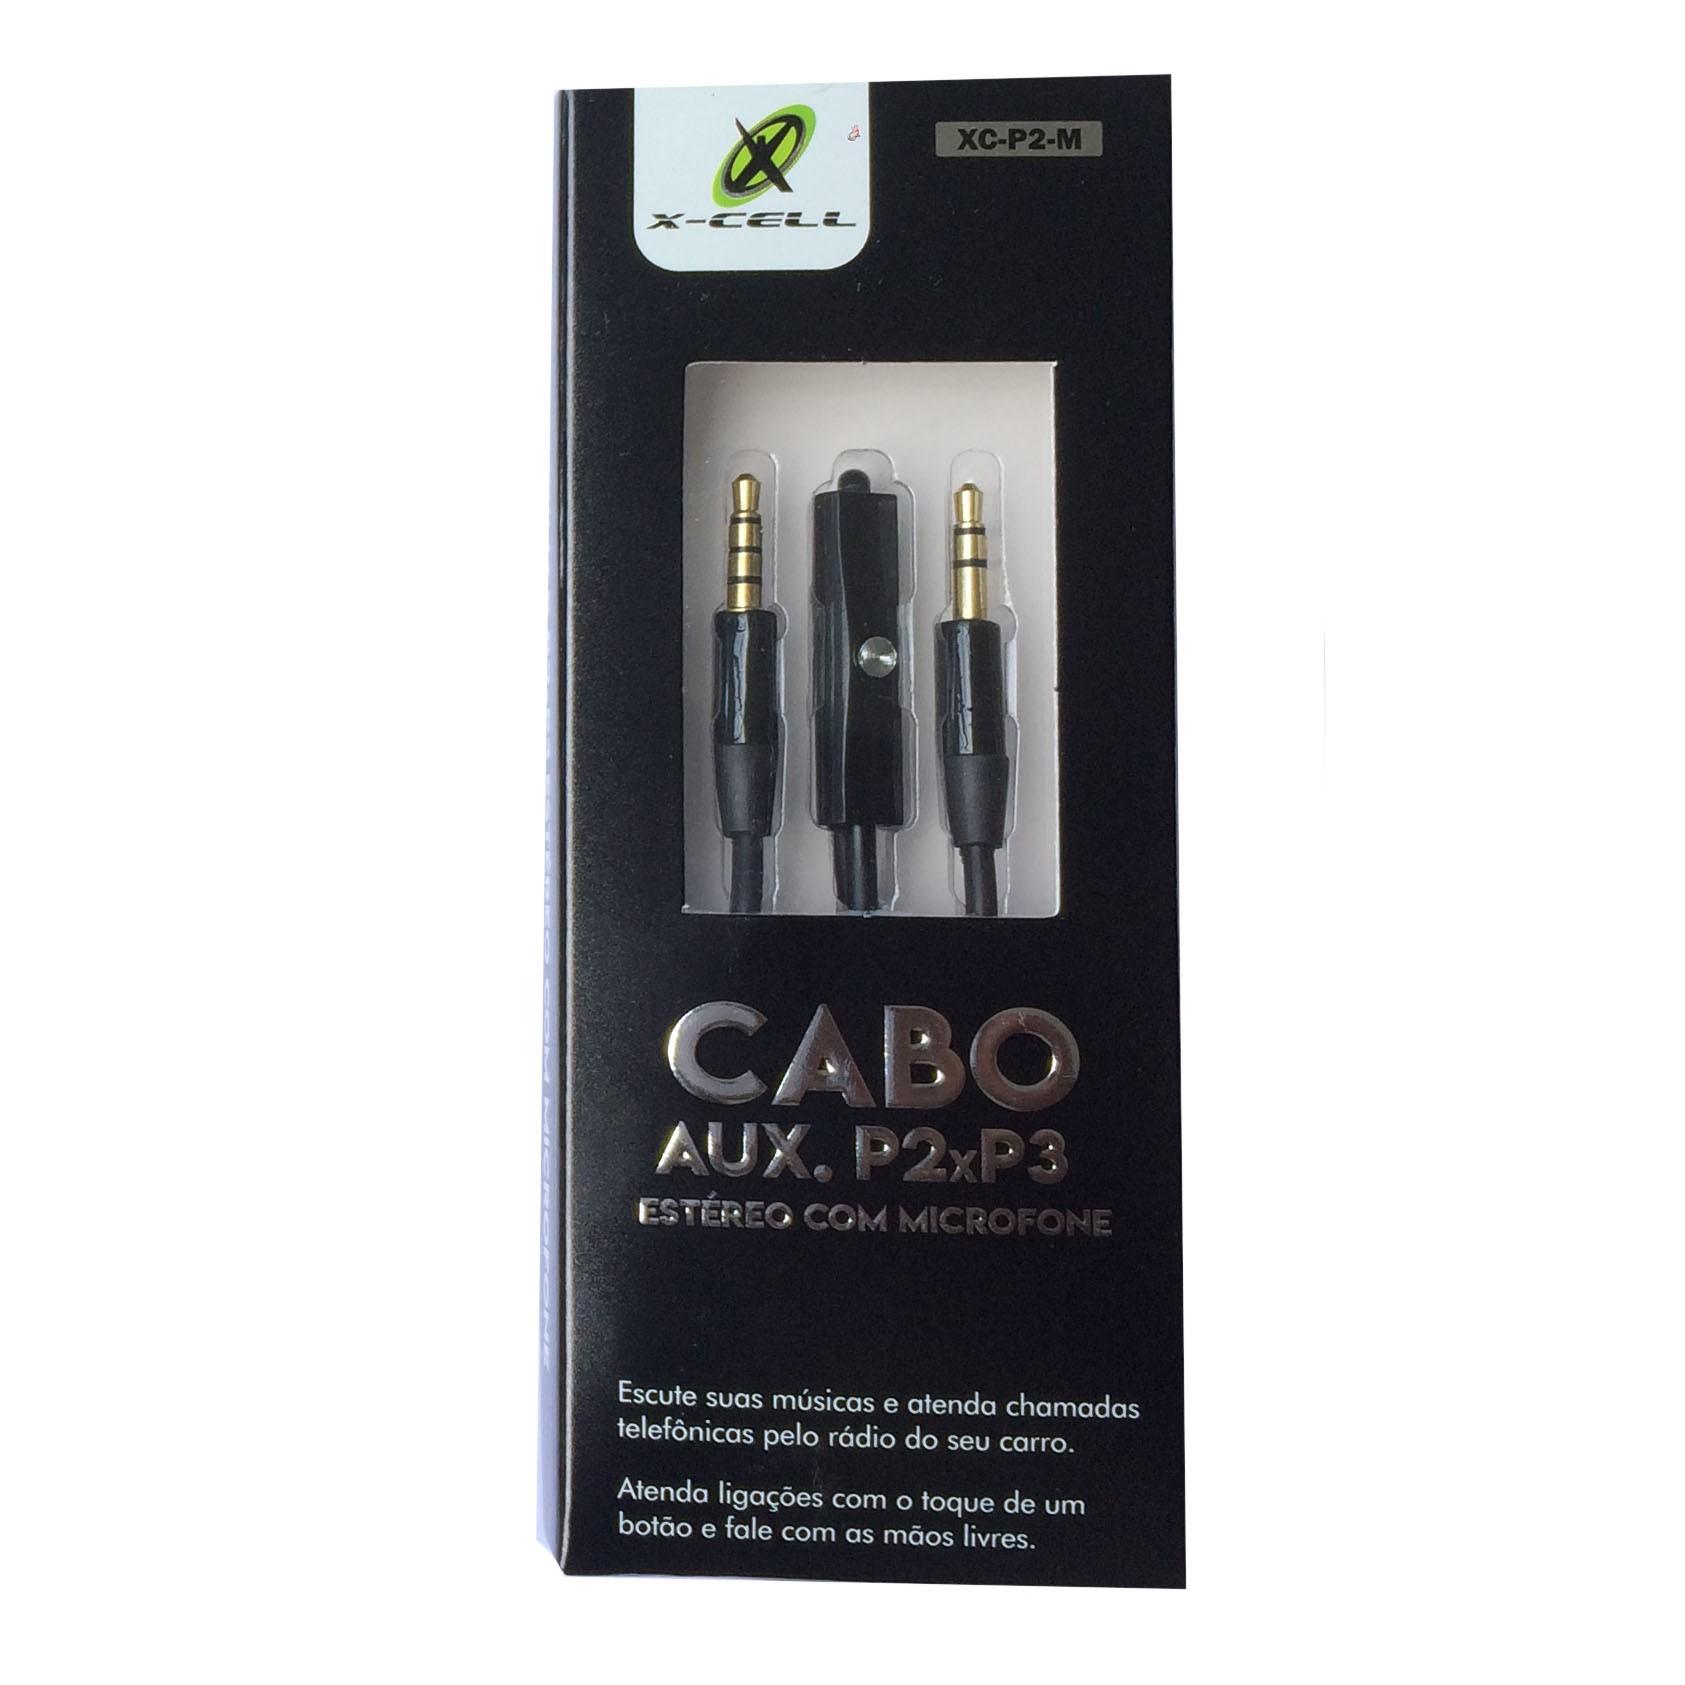 Cabo P2 x P3 C/ Microfone Embutido P/ Headset Xcell Preto - XC-P2-M